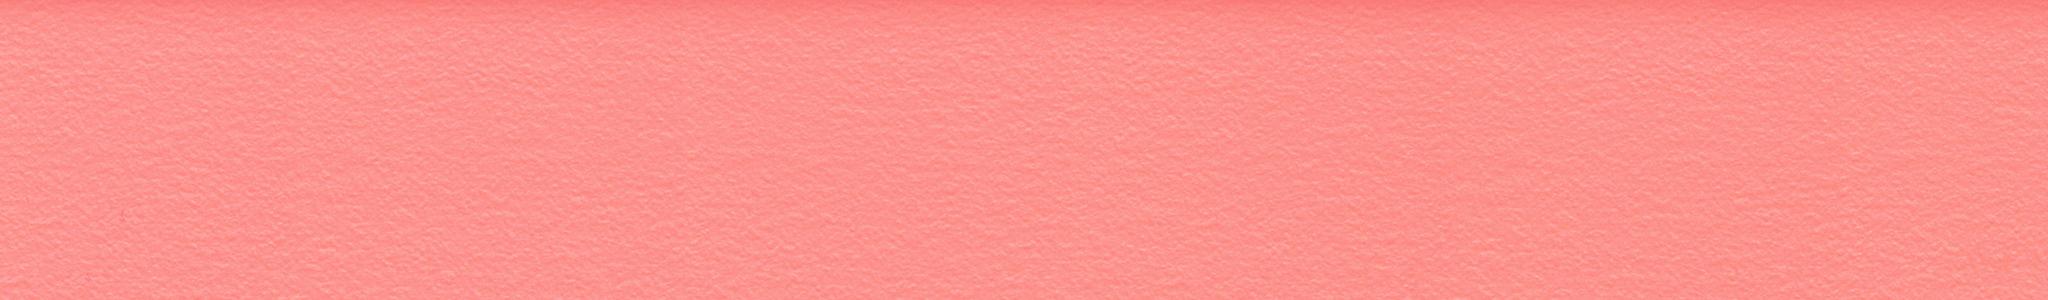 HU 130326 ABS Edge Red Soft Pearl 107